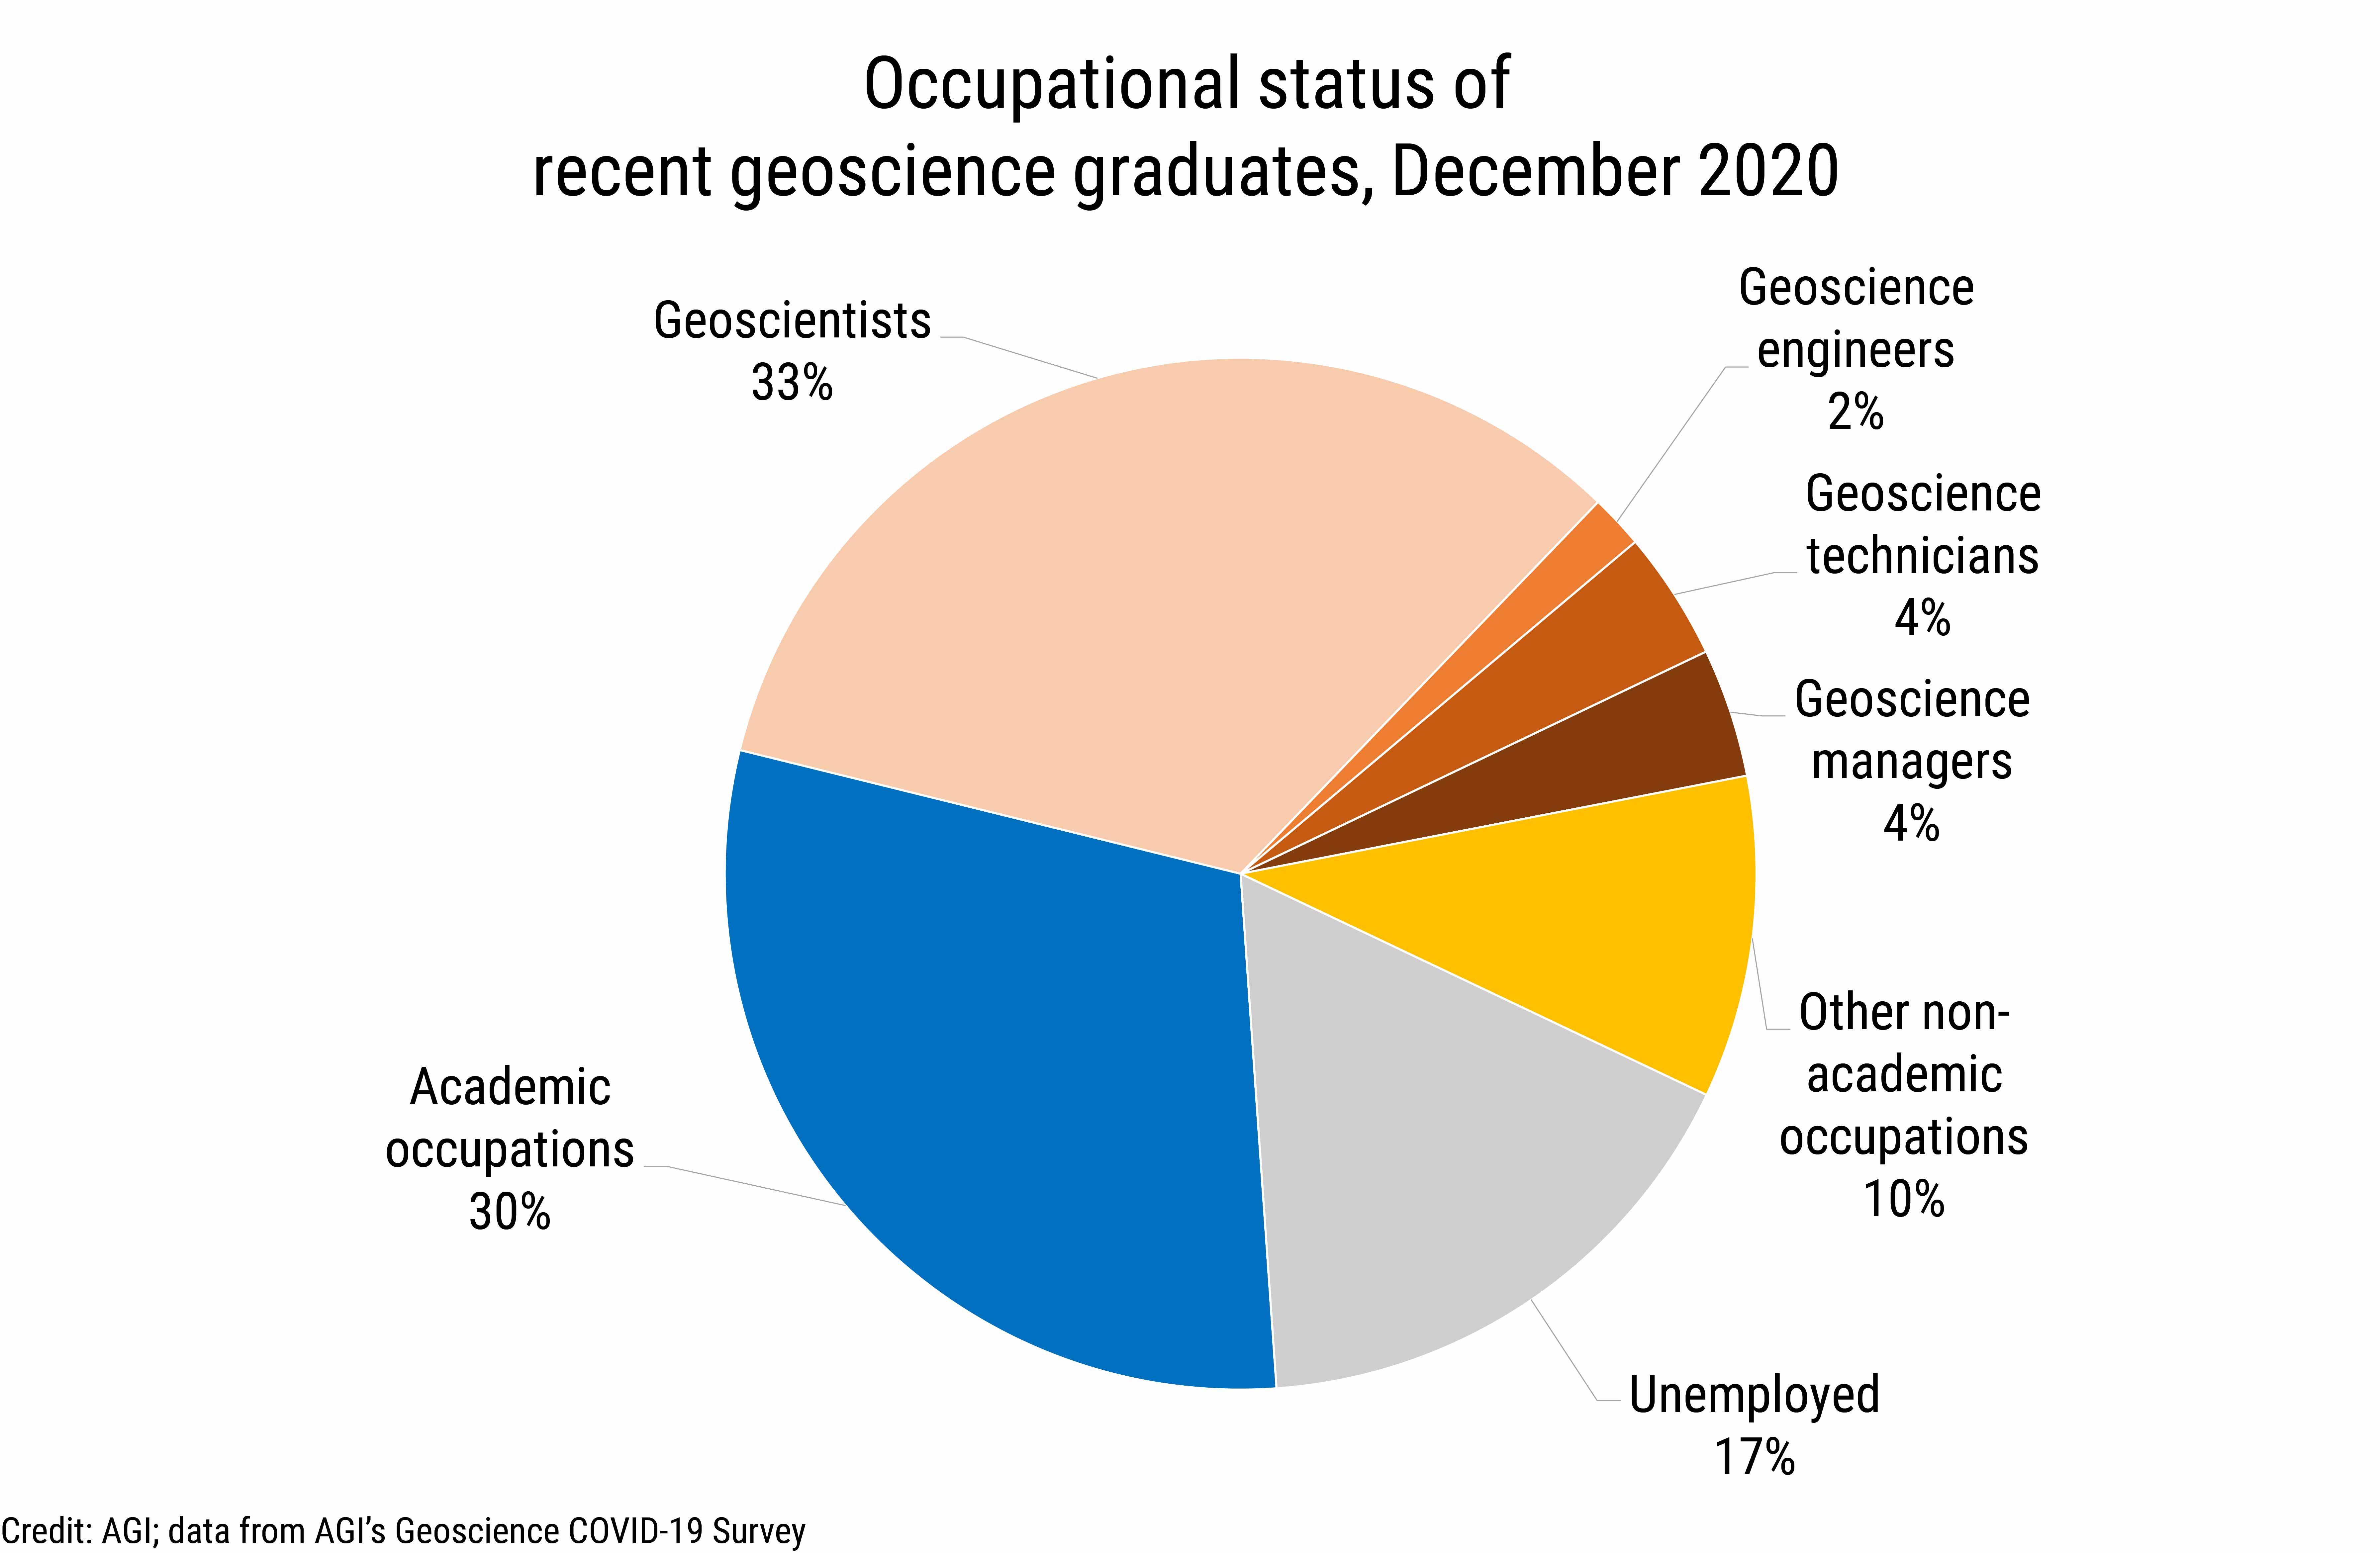 DB_2021-003_chart11: Occupational status of recent geoscience graduates, December 2020 (Credit: AGI; data from AGI's Geoscience COVID-19 Survey)